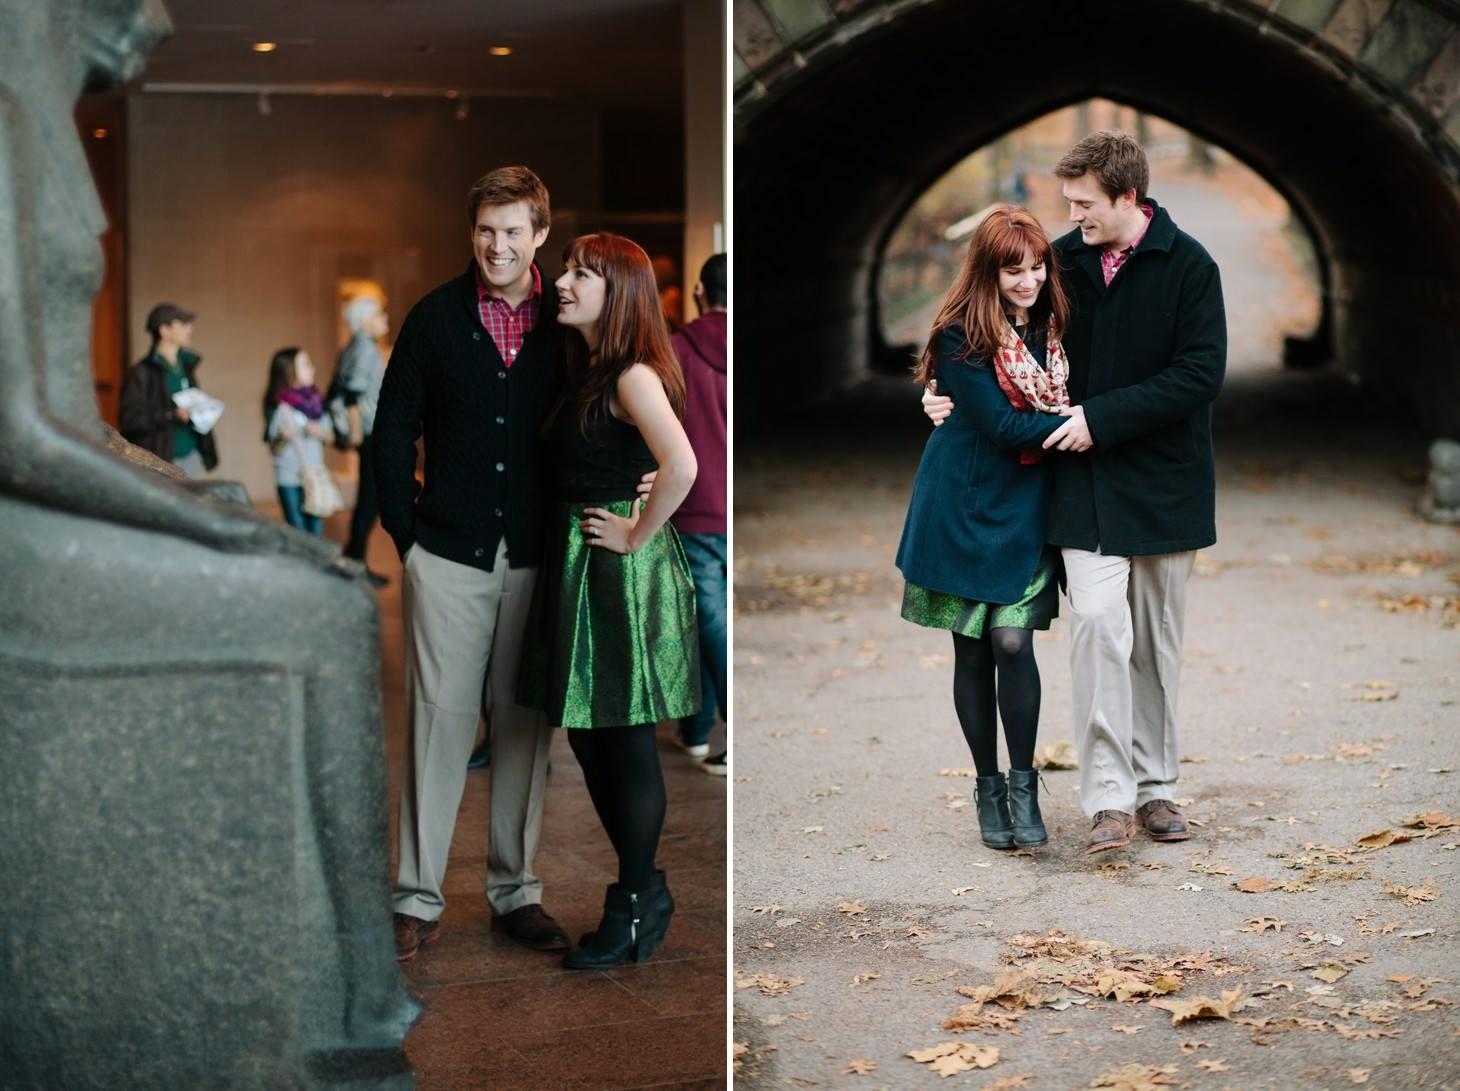 008-nyc-wedding-photographer-smitten-chickens-elope-nyc-wedding-photographer-museum-wedding-smitten-chickens-metropolitan-museum-nyc-engagement-photos-x.jpg